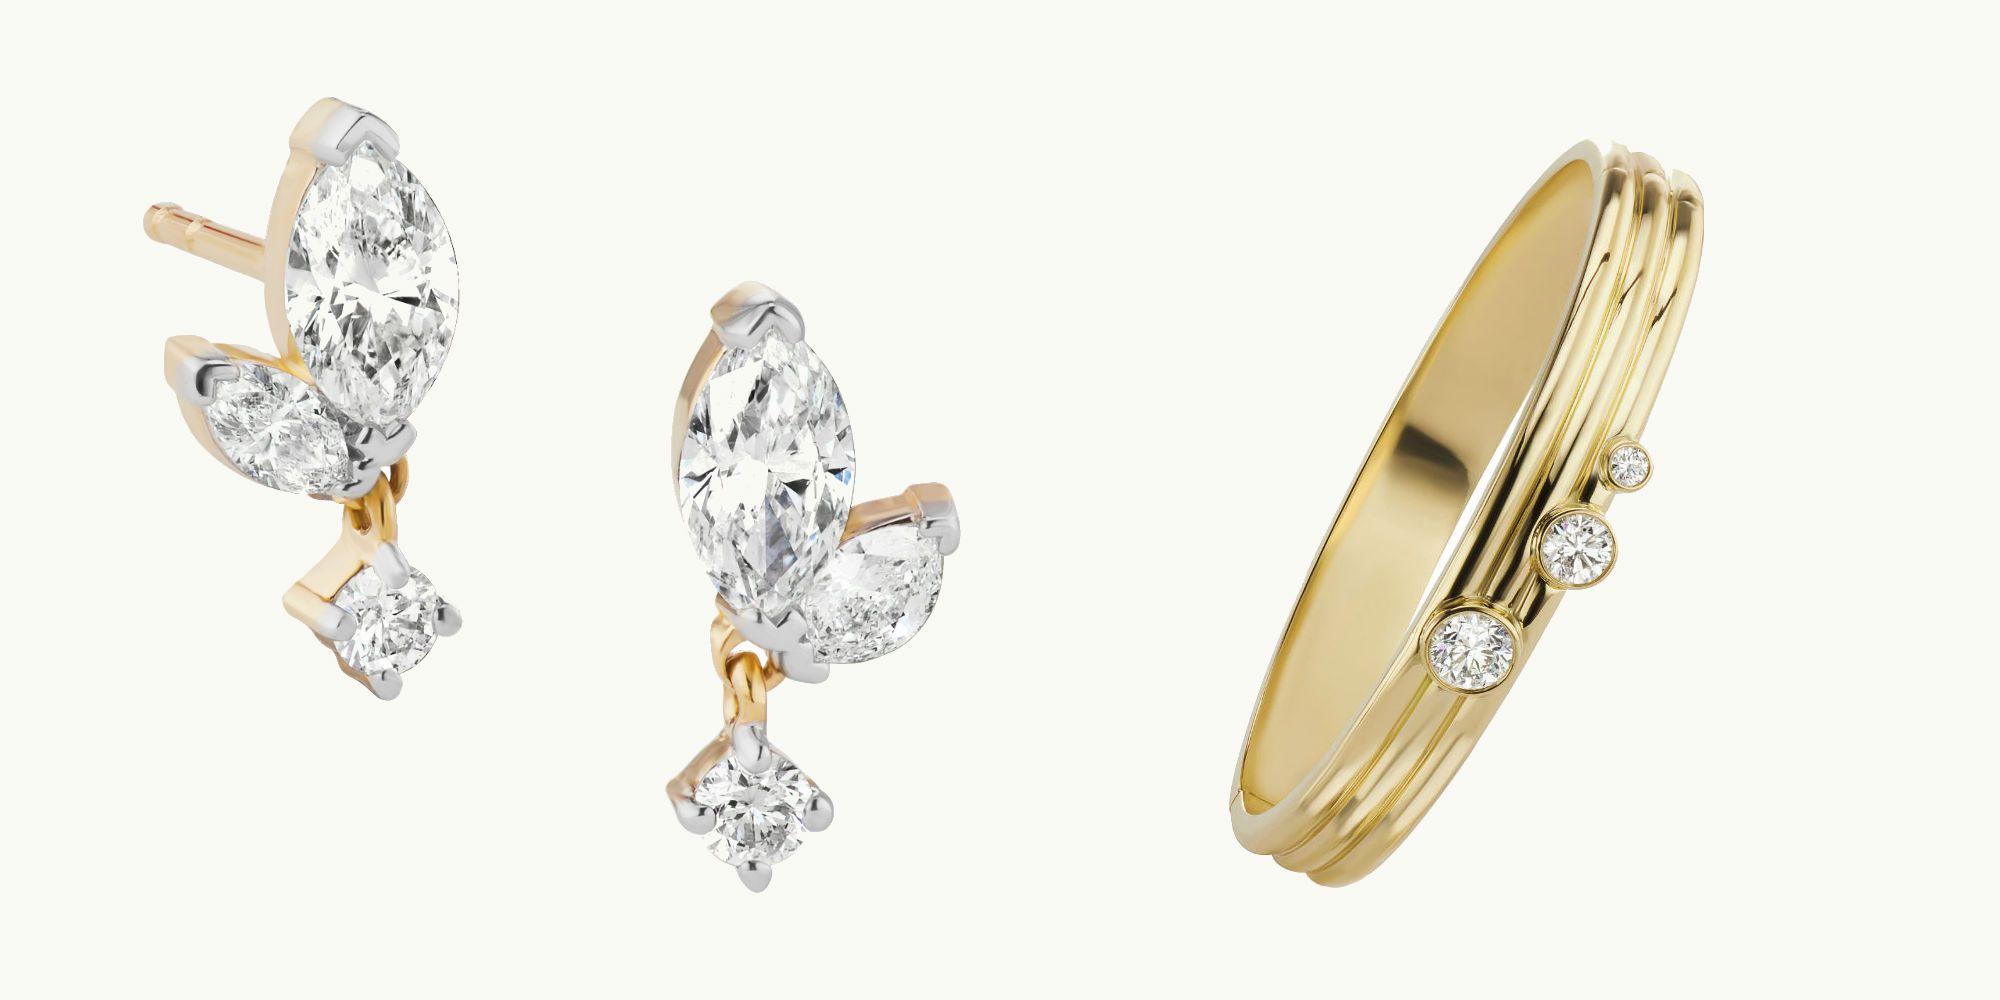 6 Perfect Pieces of Treat-Yourself Diamond Jewelry